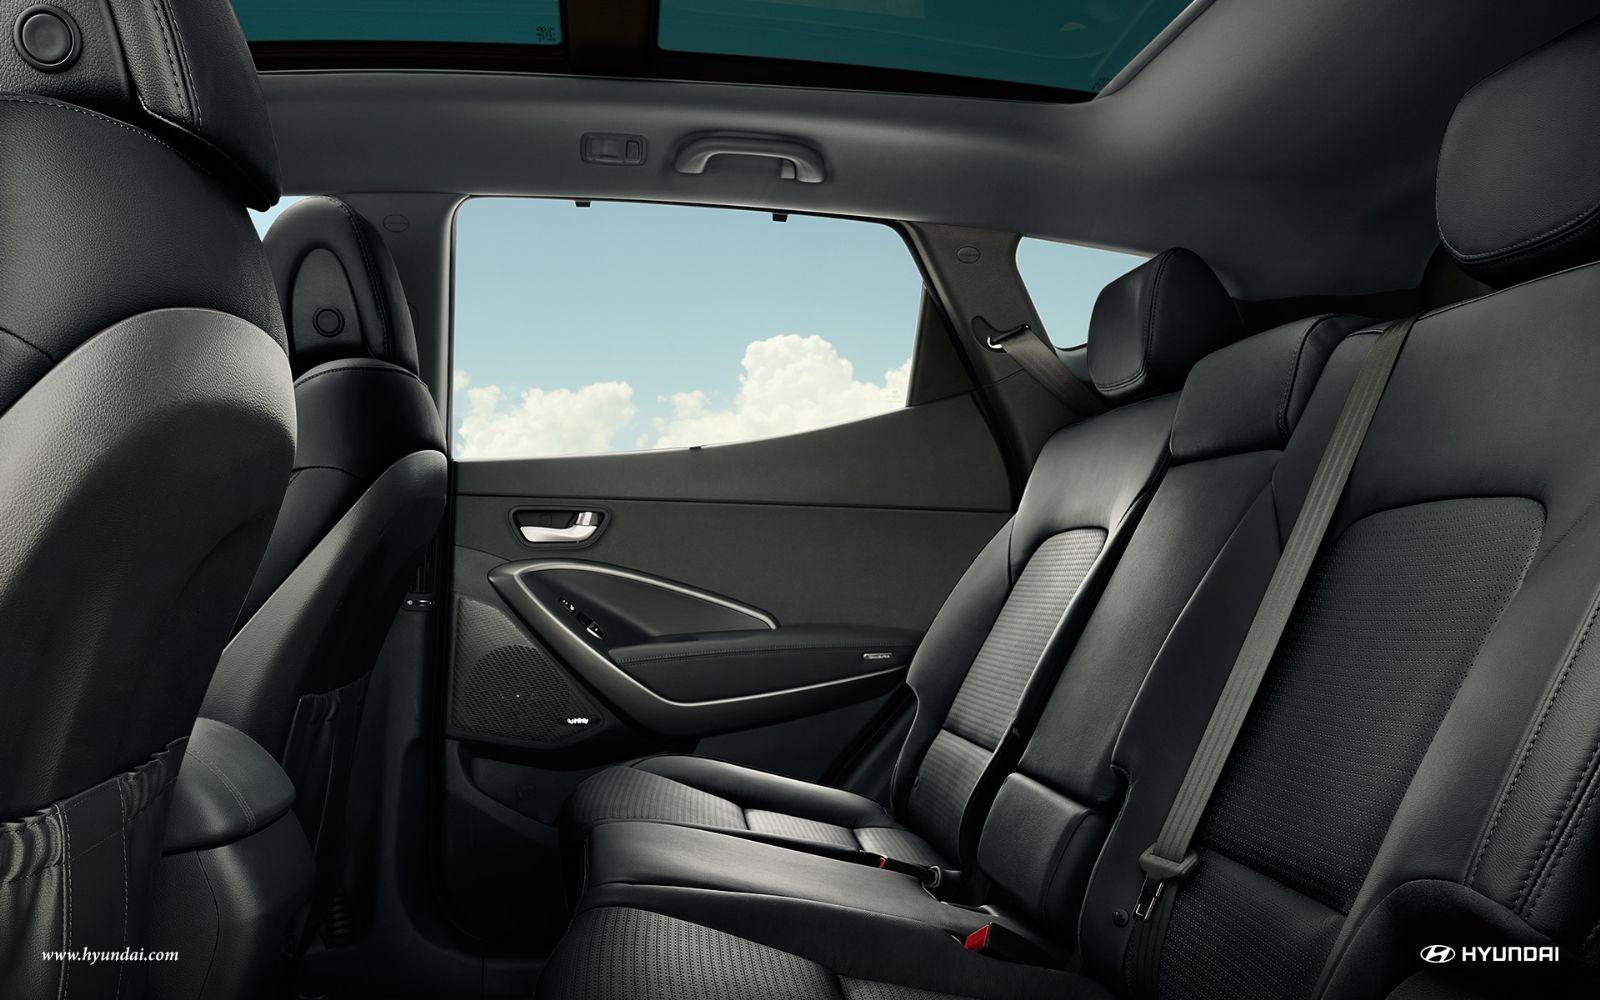 Đánh giá xe Hyundai Santafe 2016 CKD